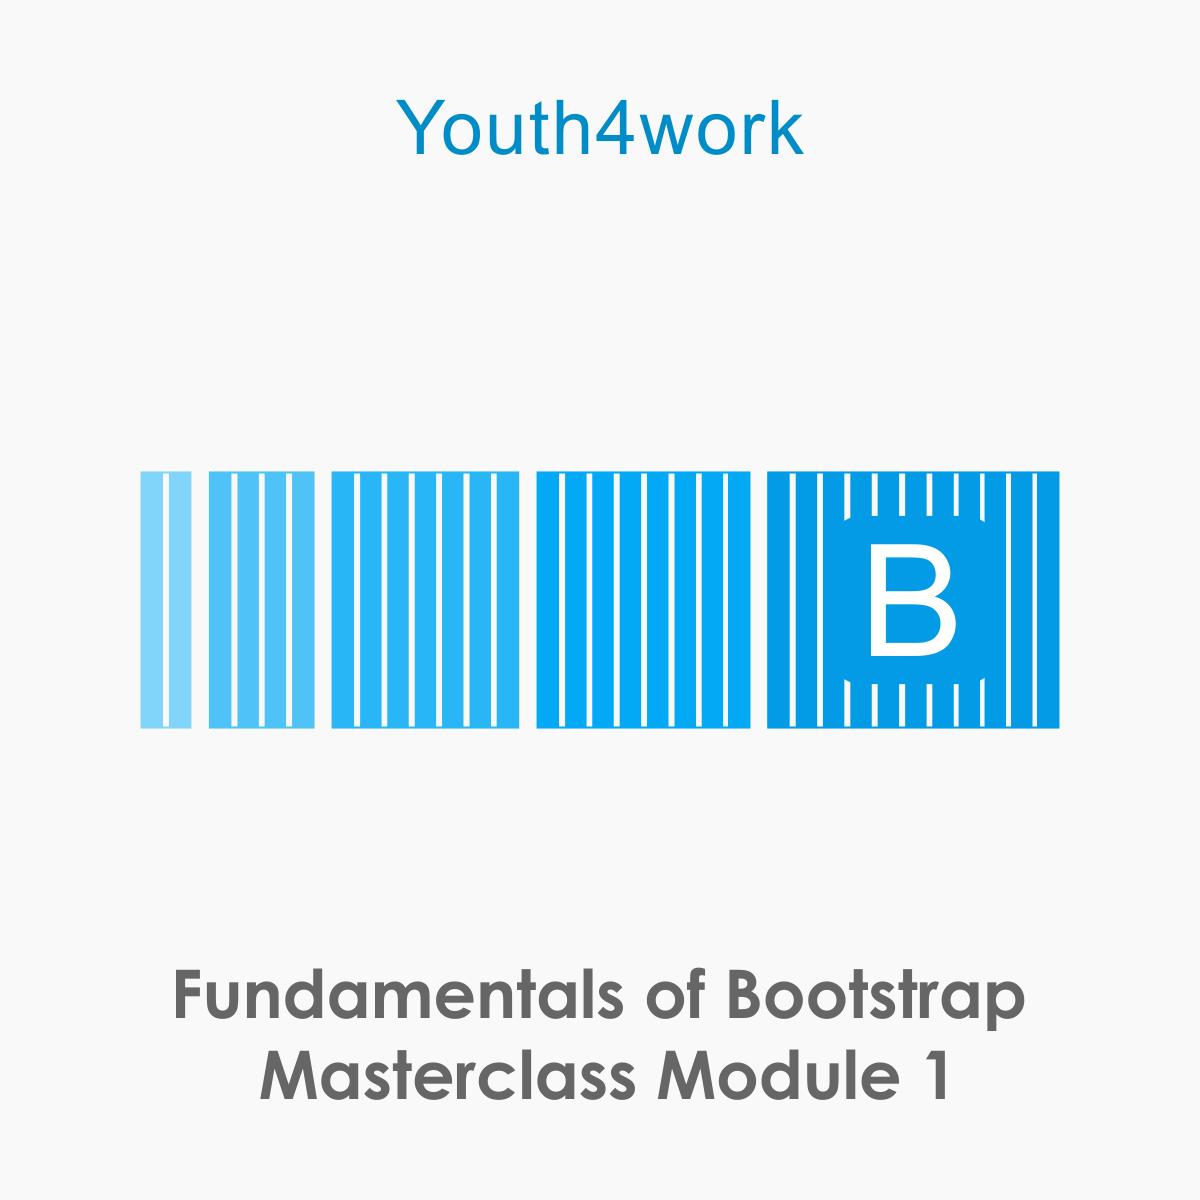 Fundamentals of Bootstrap Masterclass Module 1